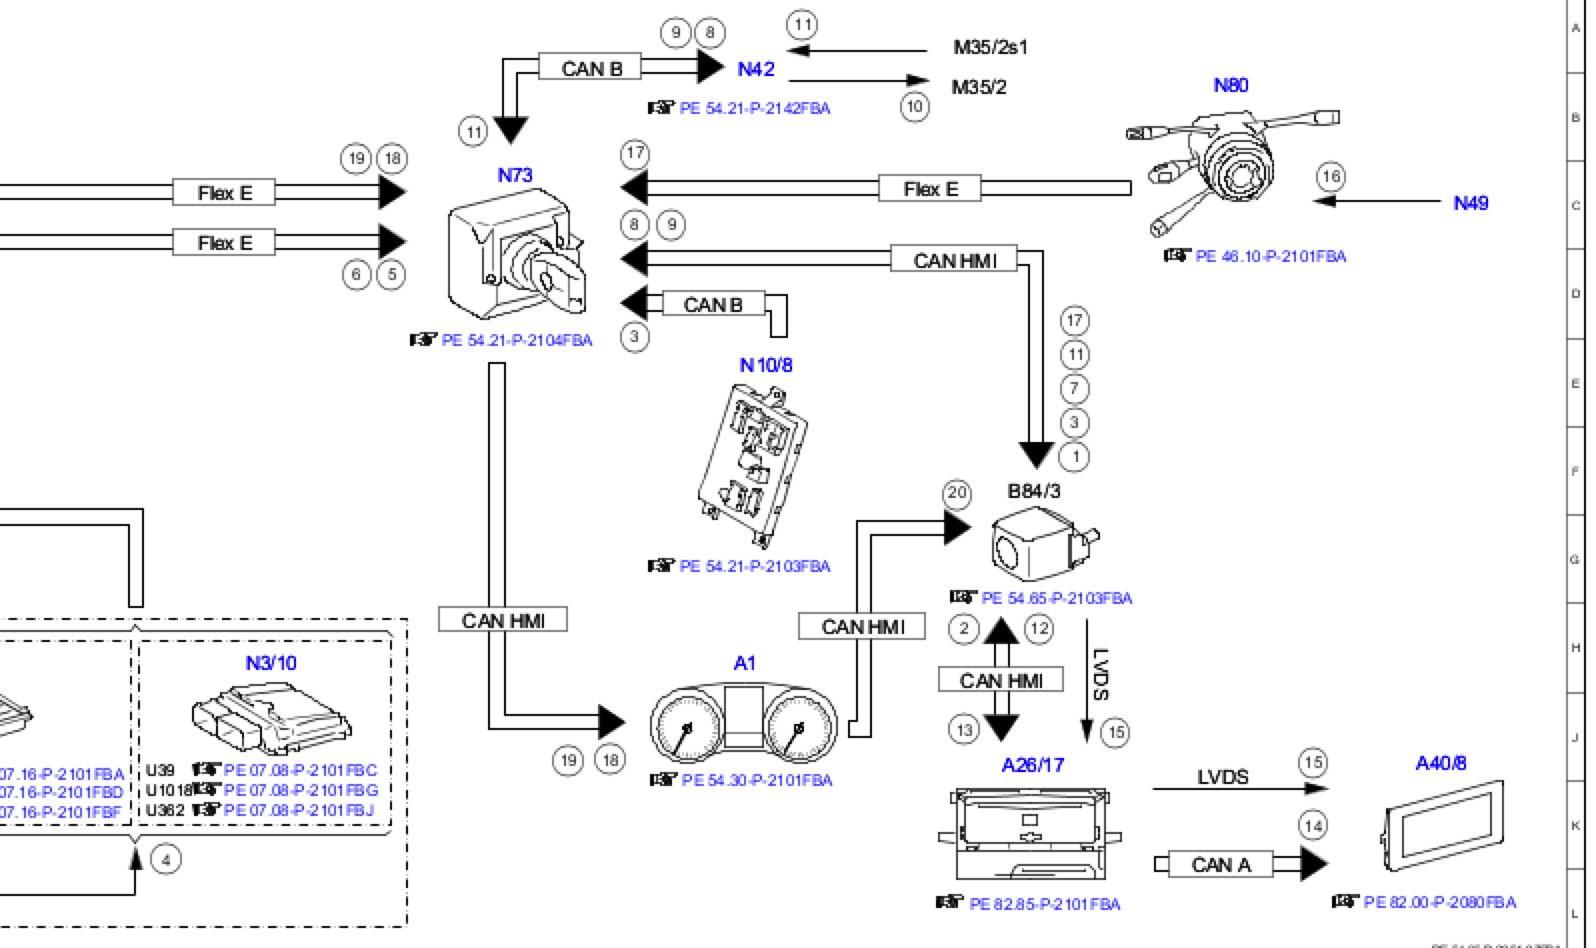 C300 Aftermarket Rear View Camera Diy Install